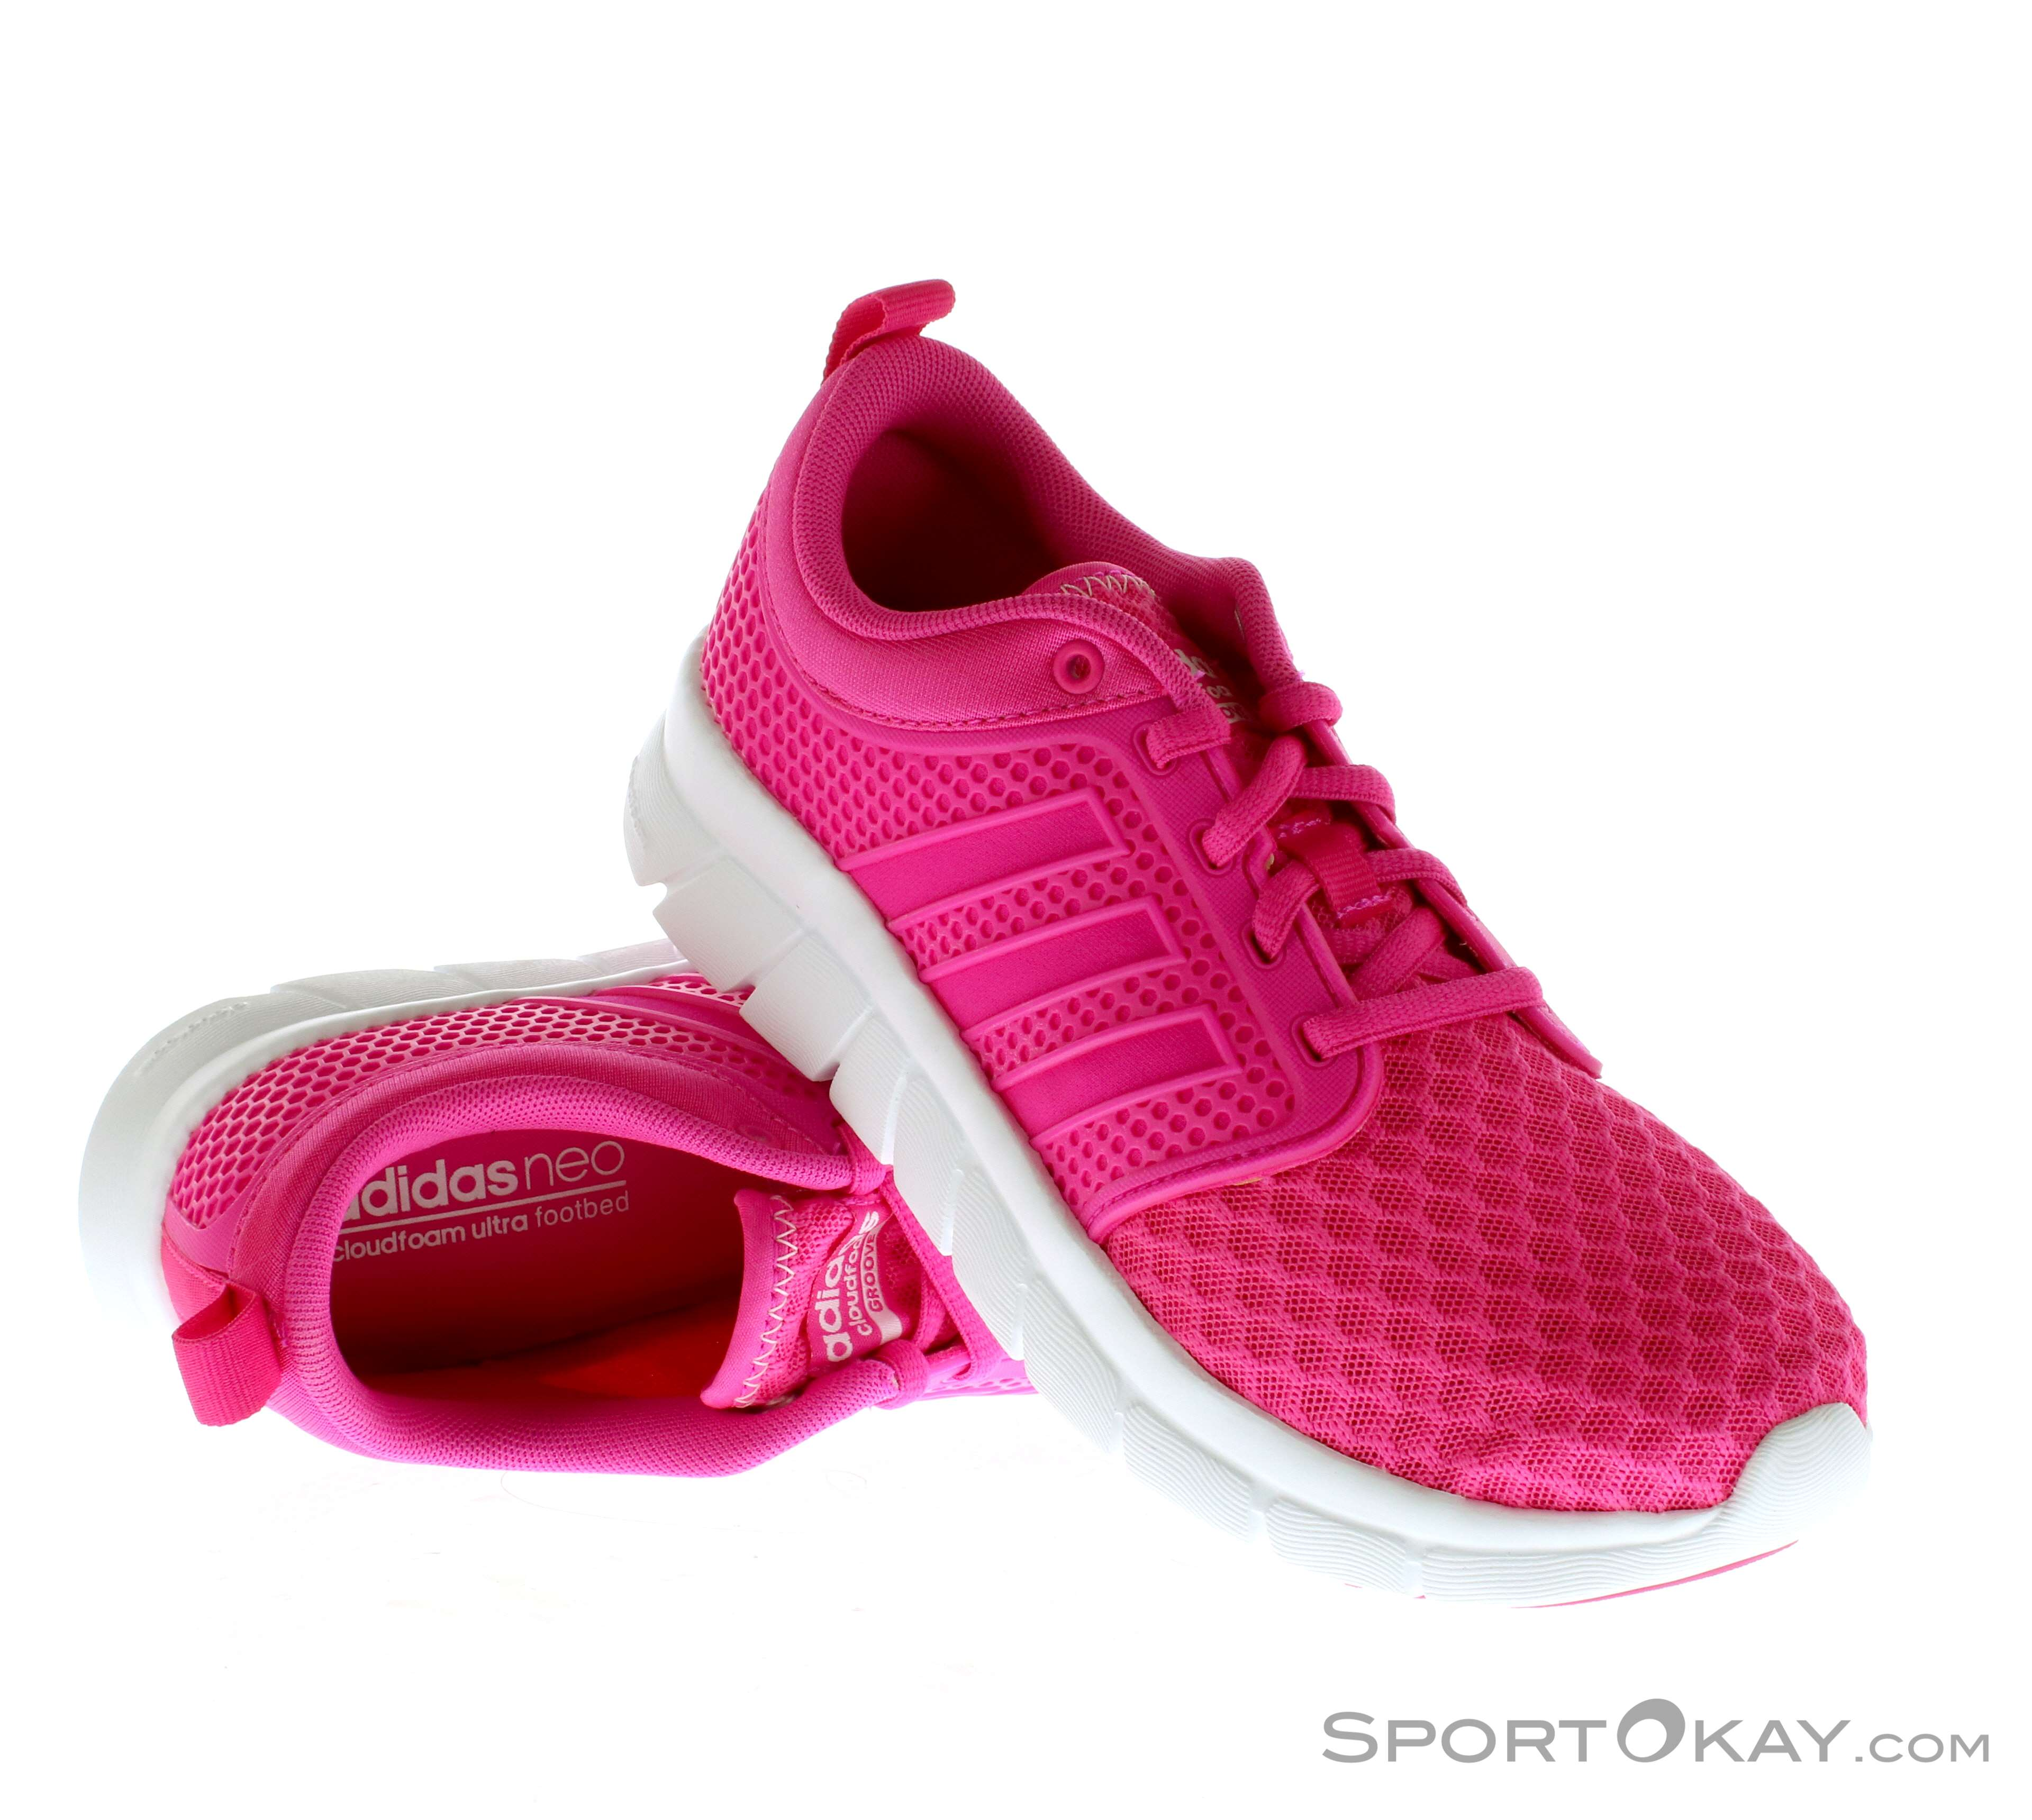 adidas adidas Cloudfoam Groove Womens Leisure Shoes